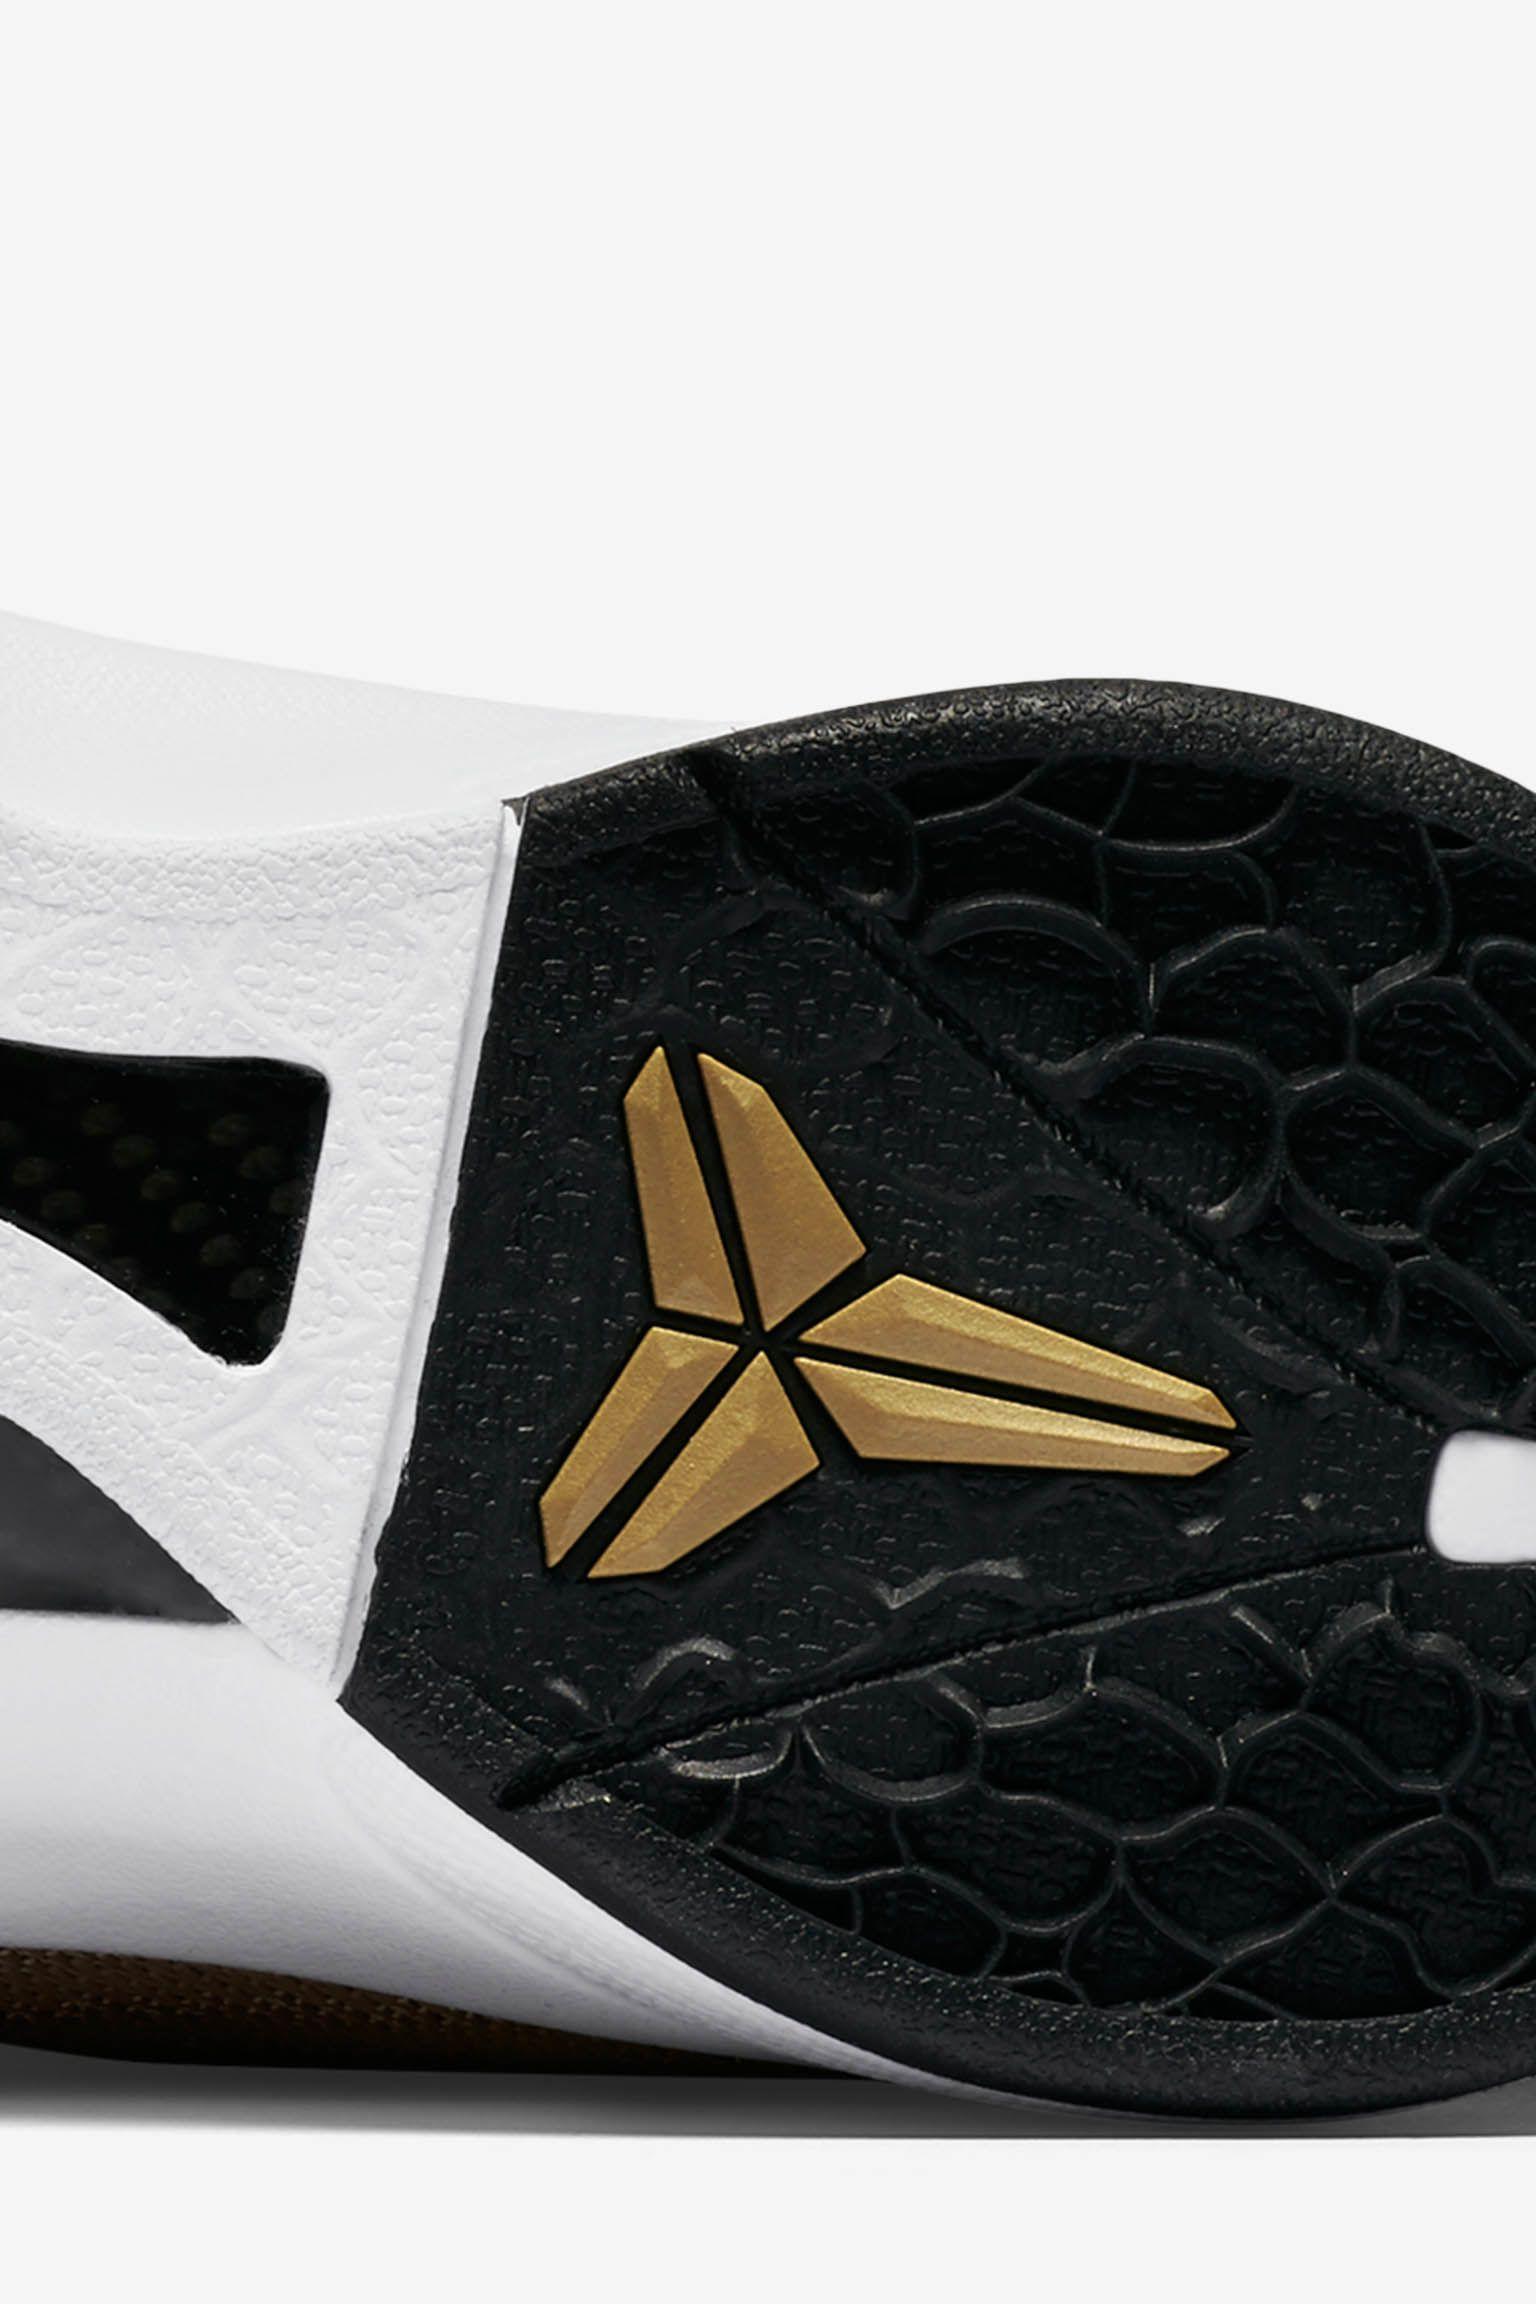 Nike Zoom Kobe Icon 'Metallic Gold' Release Date